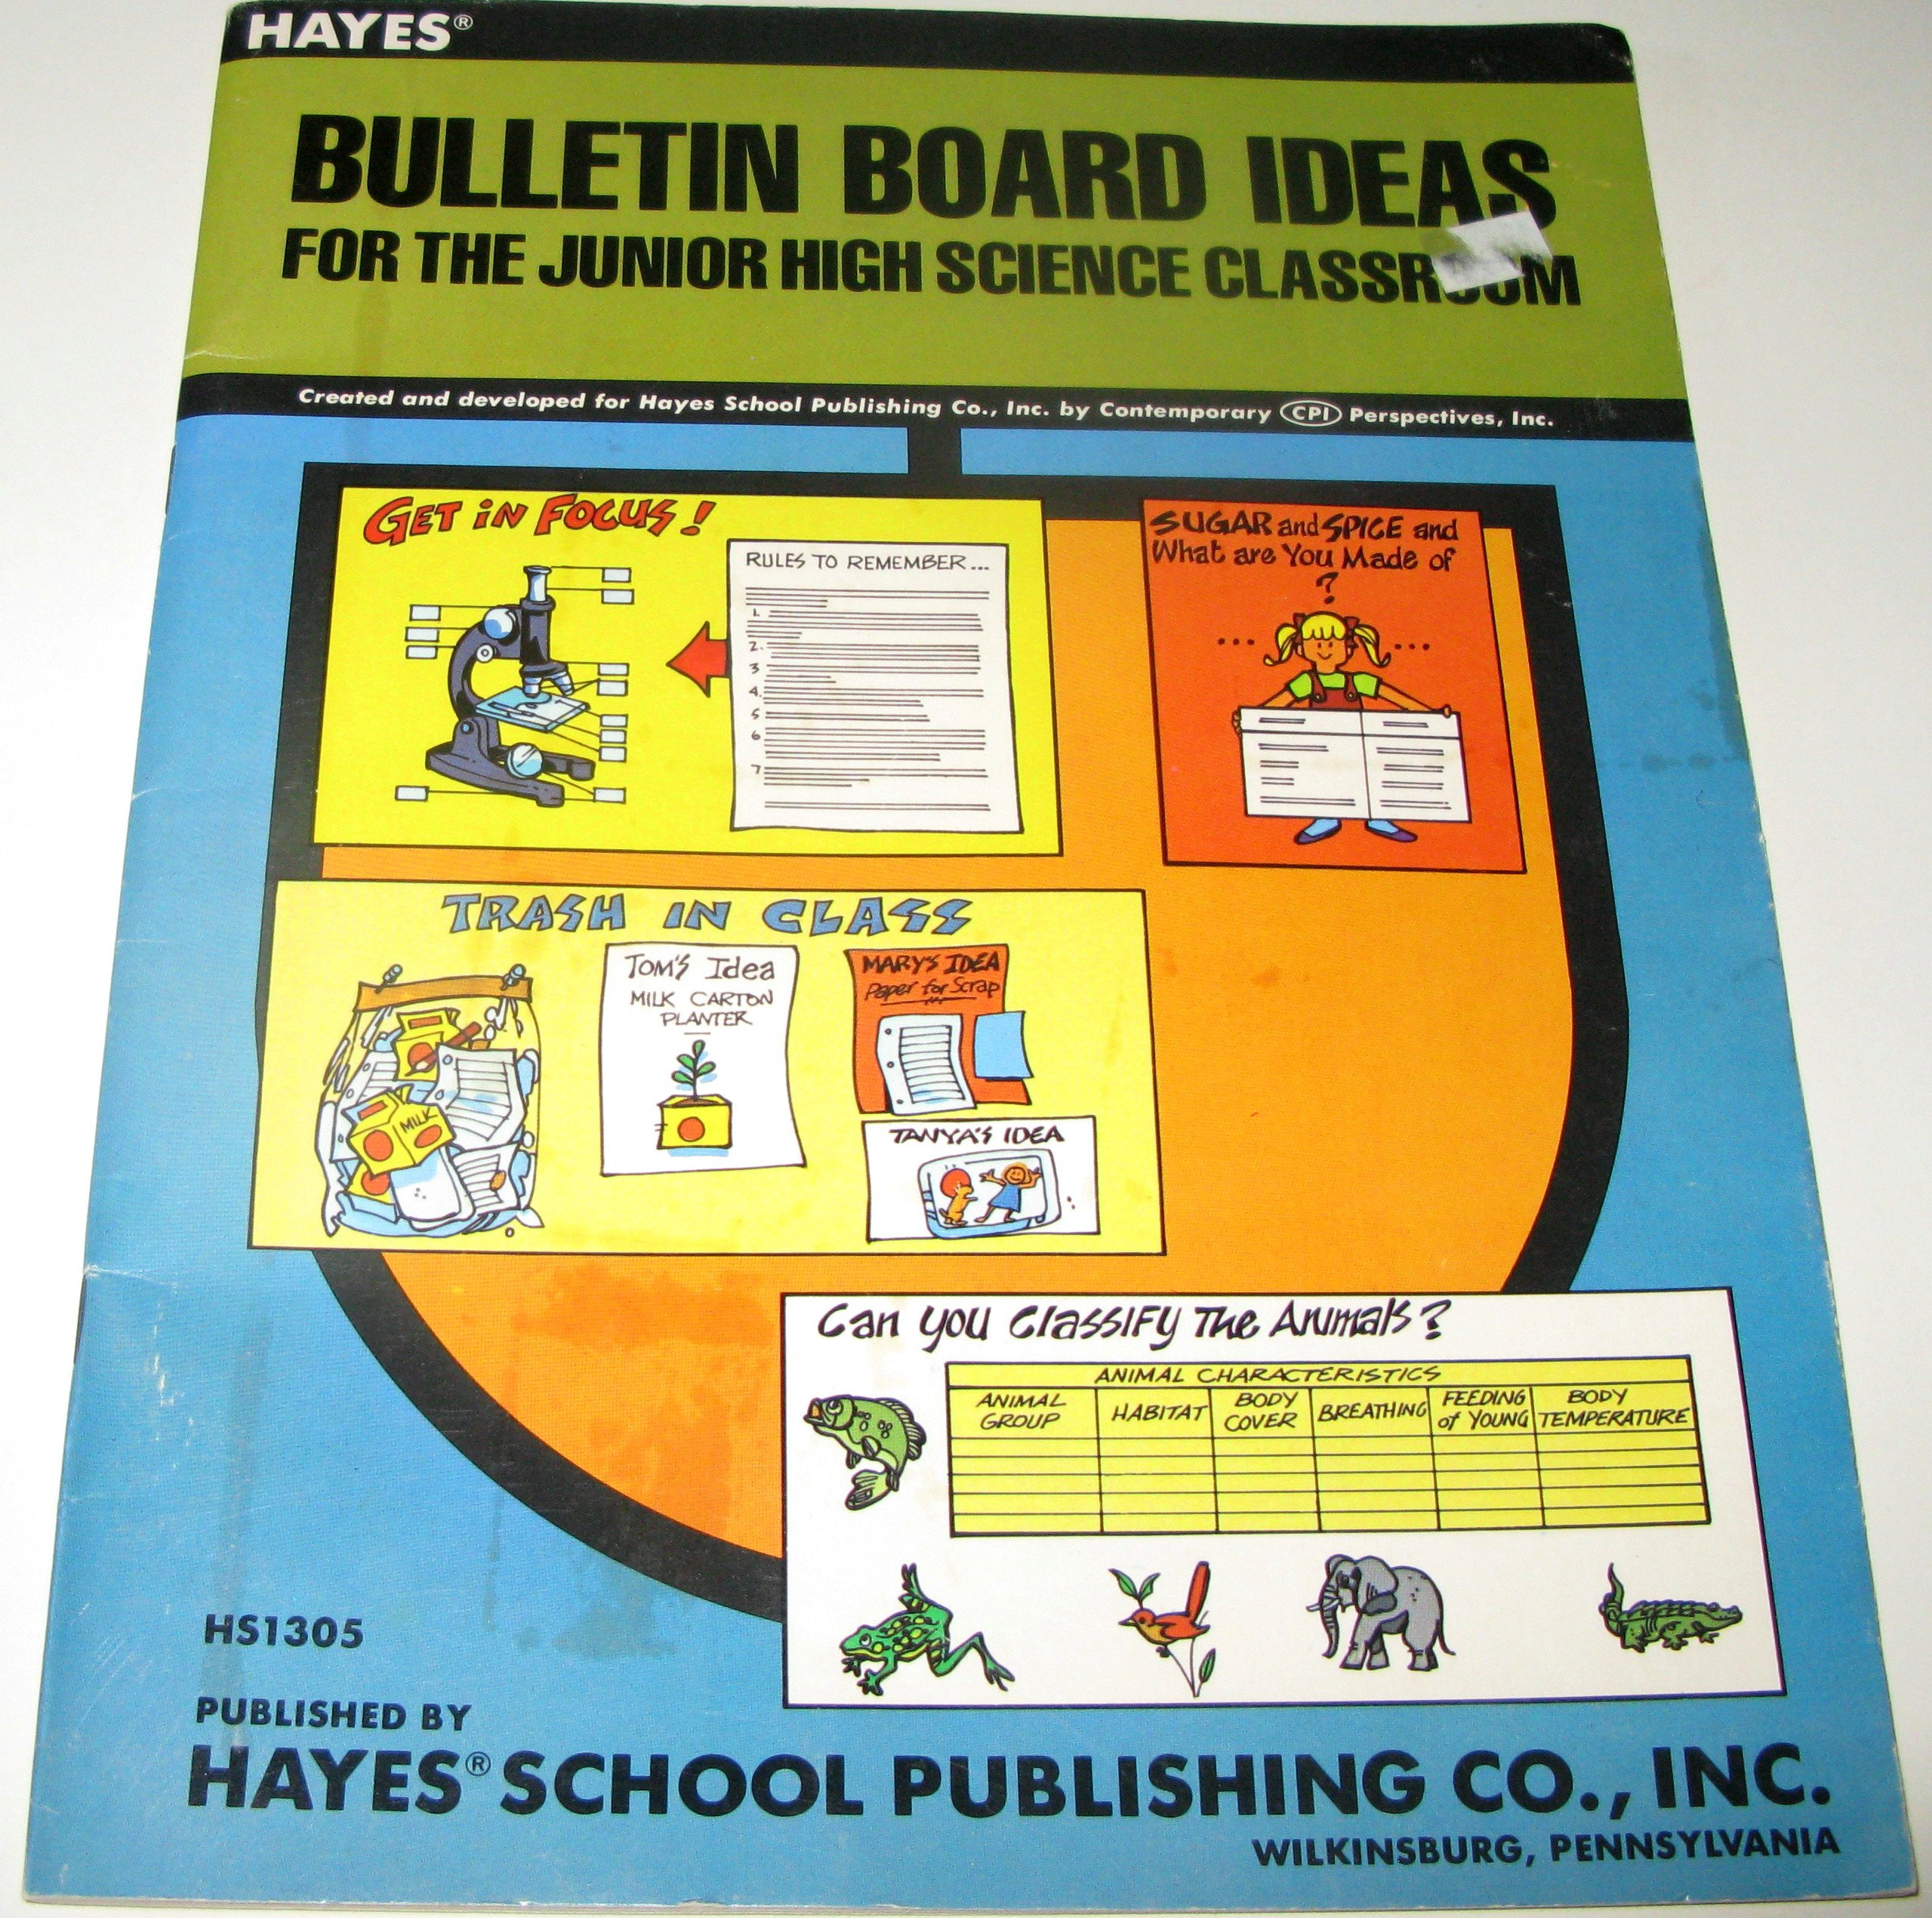 Bulletin Board Ideas for the Junior High Science Classroom